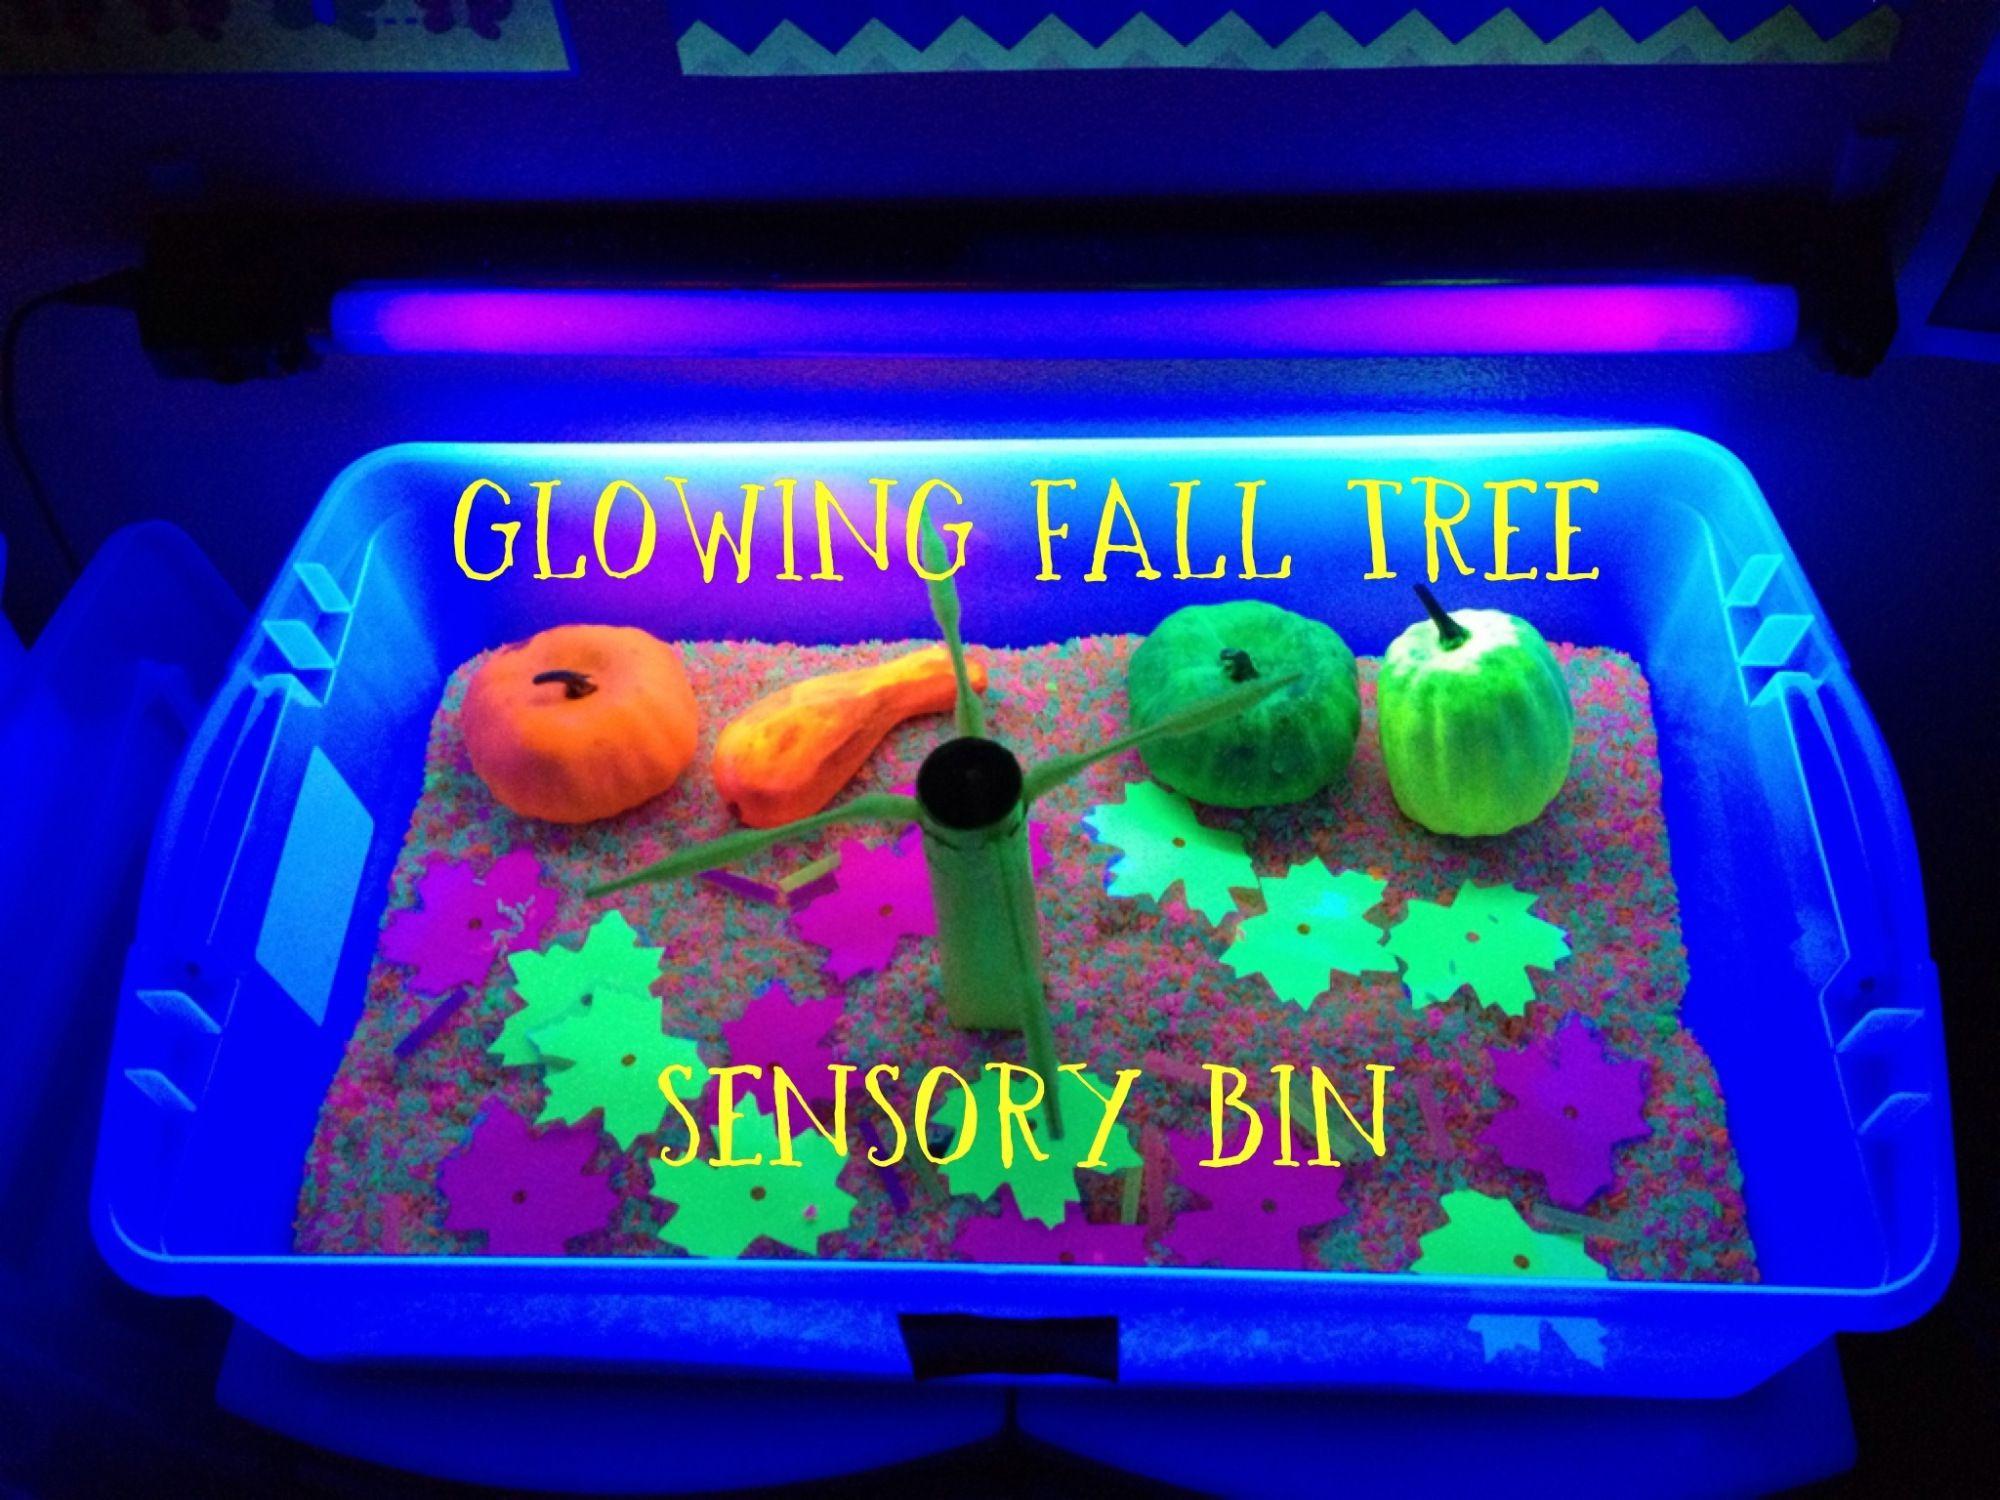 Glowing Fall Sensory Bin